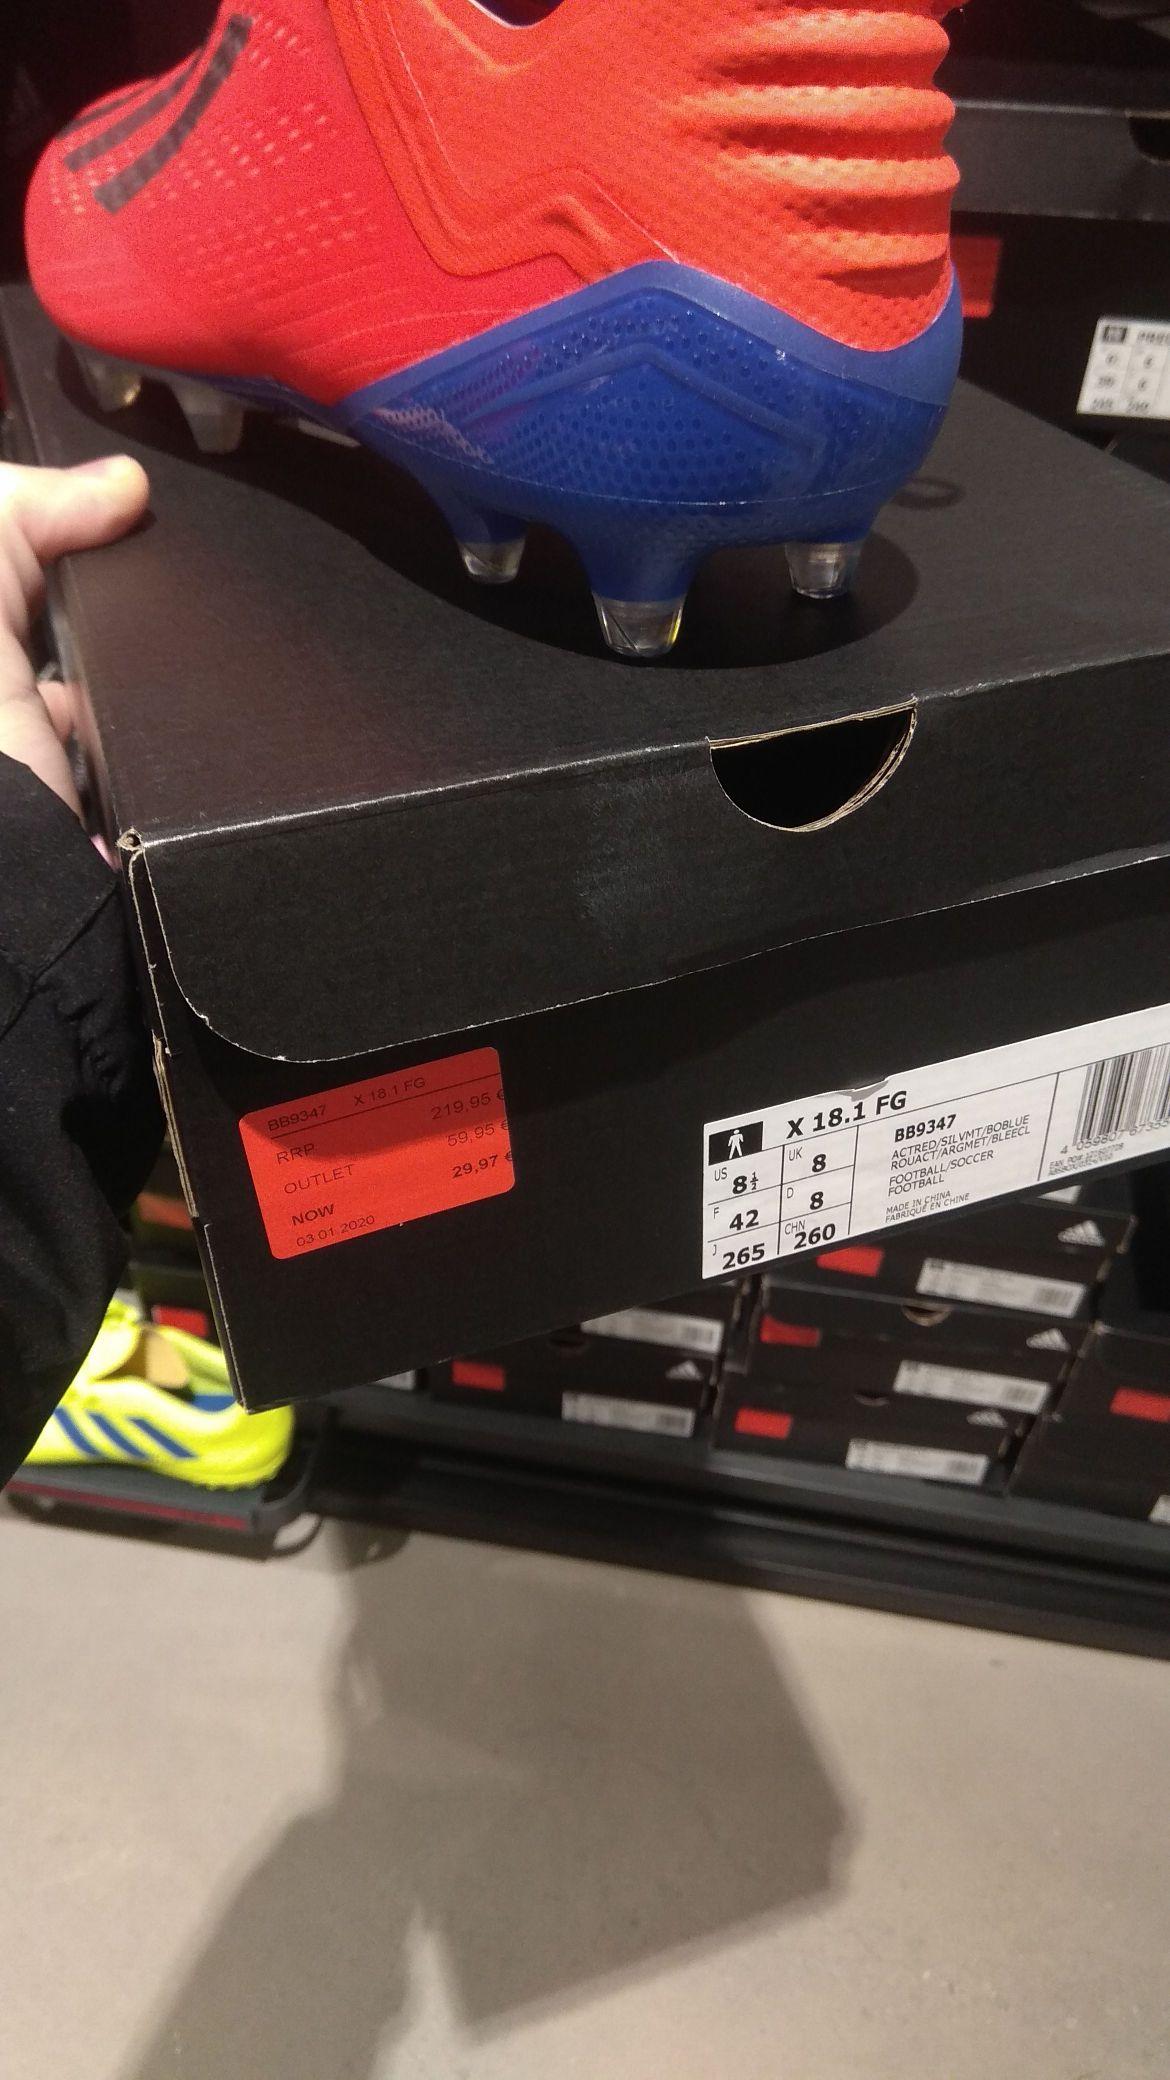 Adidas X 18.1 FG (Adidas Outlet San Sebastián de los Reyes)